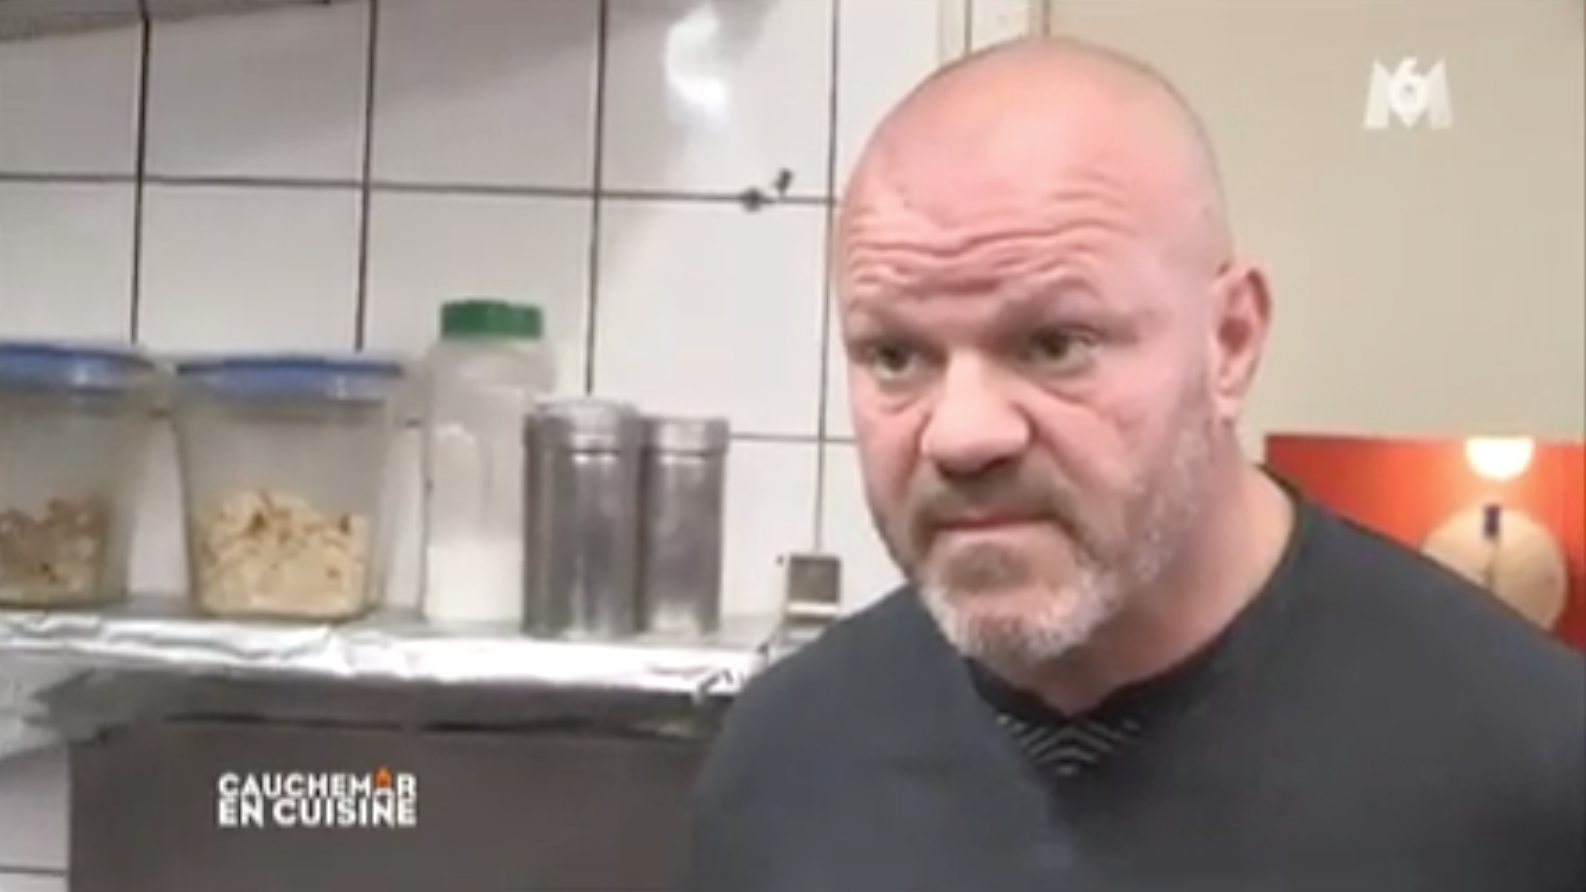 Cauchemar en cuisine un cuisinier humili devant toute la france - Cauchemar en cuisine en france ...